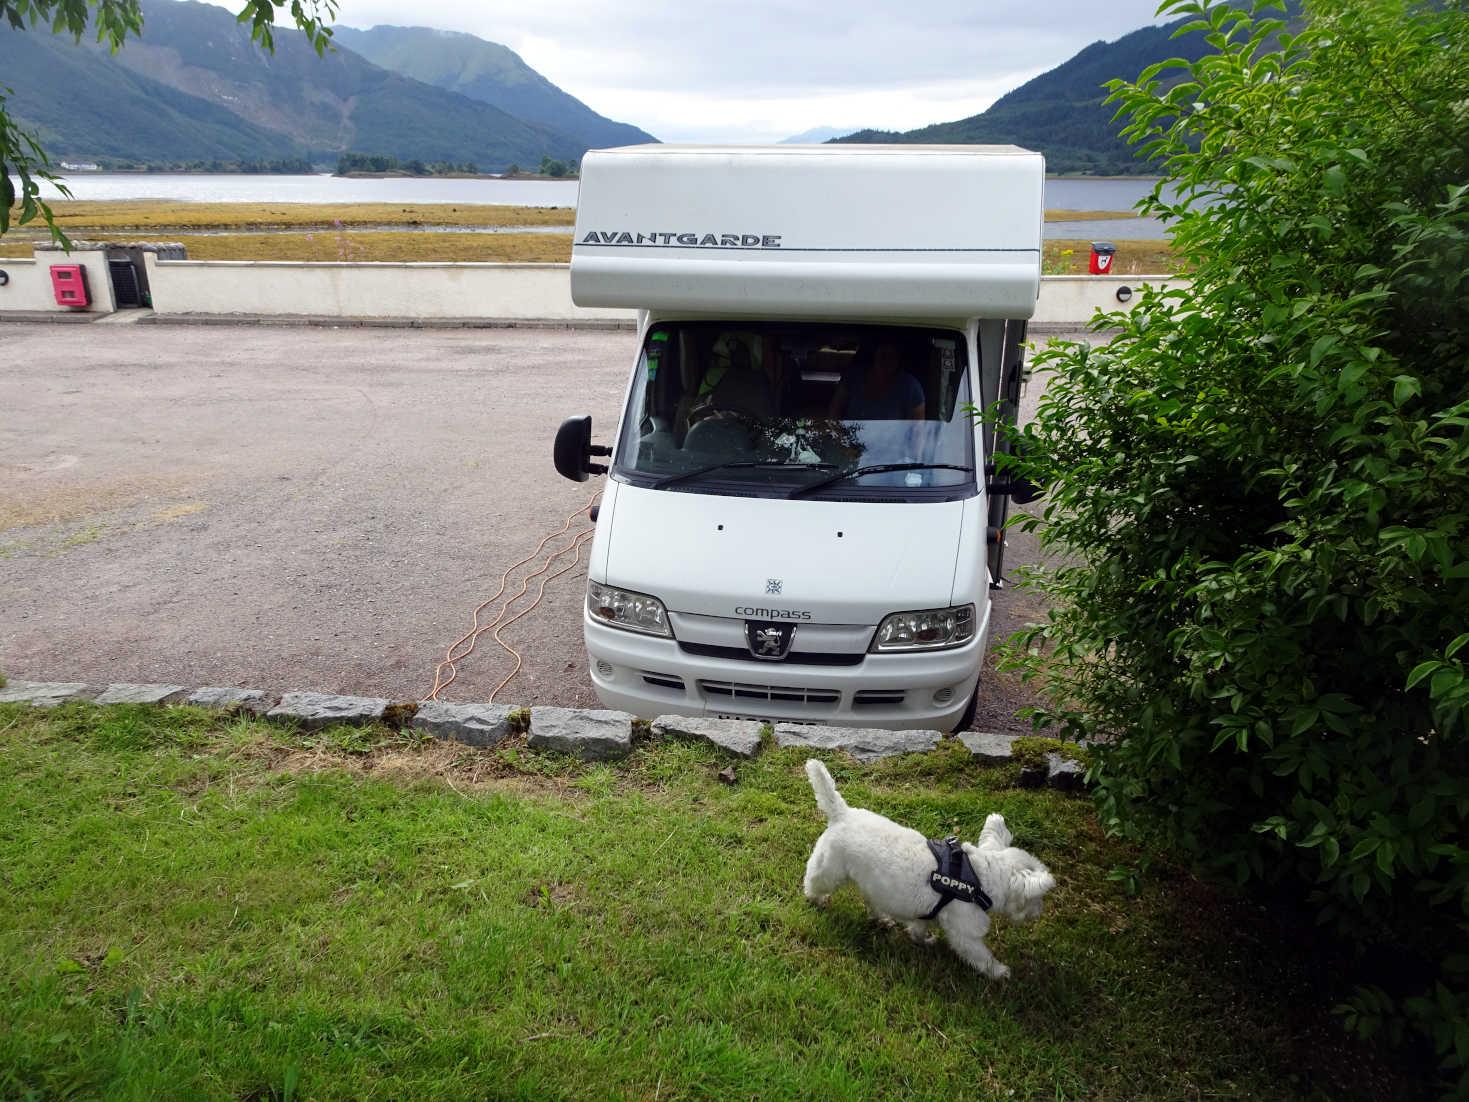 poppy explores campsite at glen coe